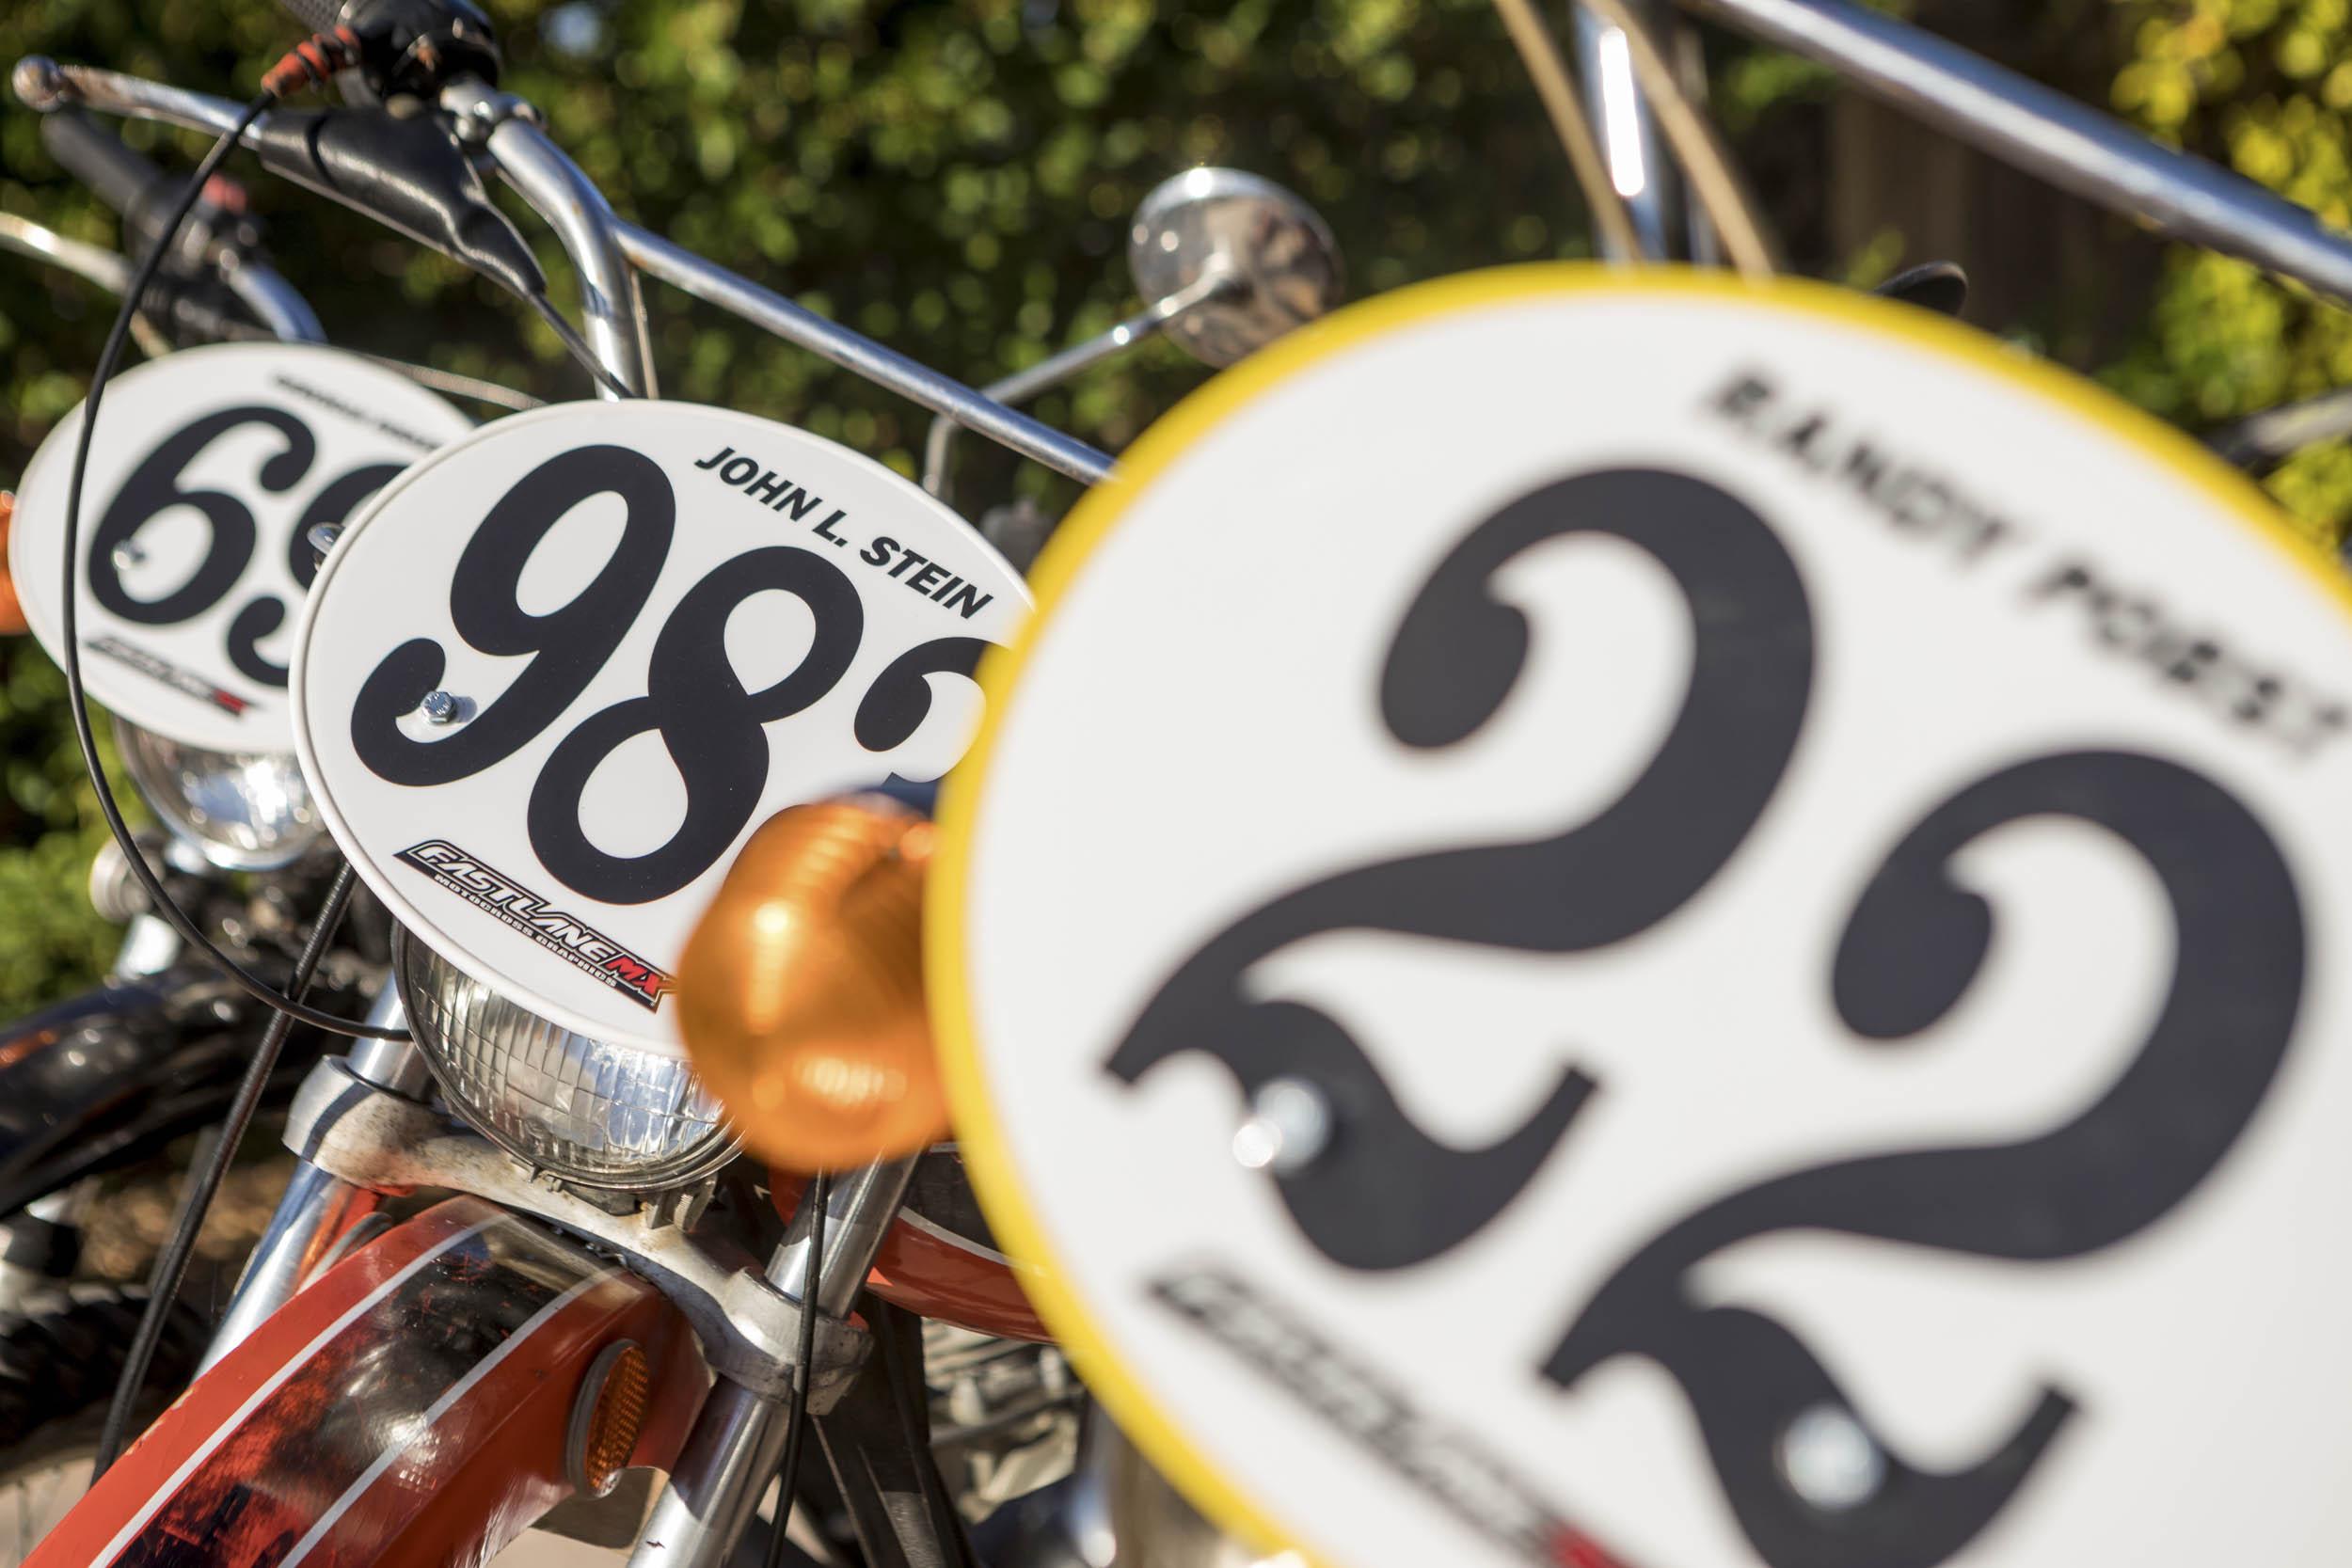 Dirt bike numbers